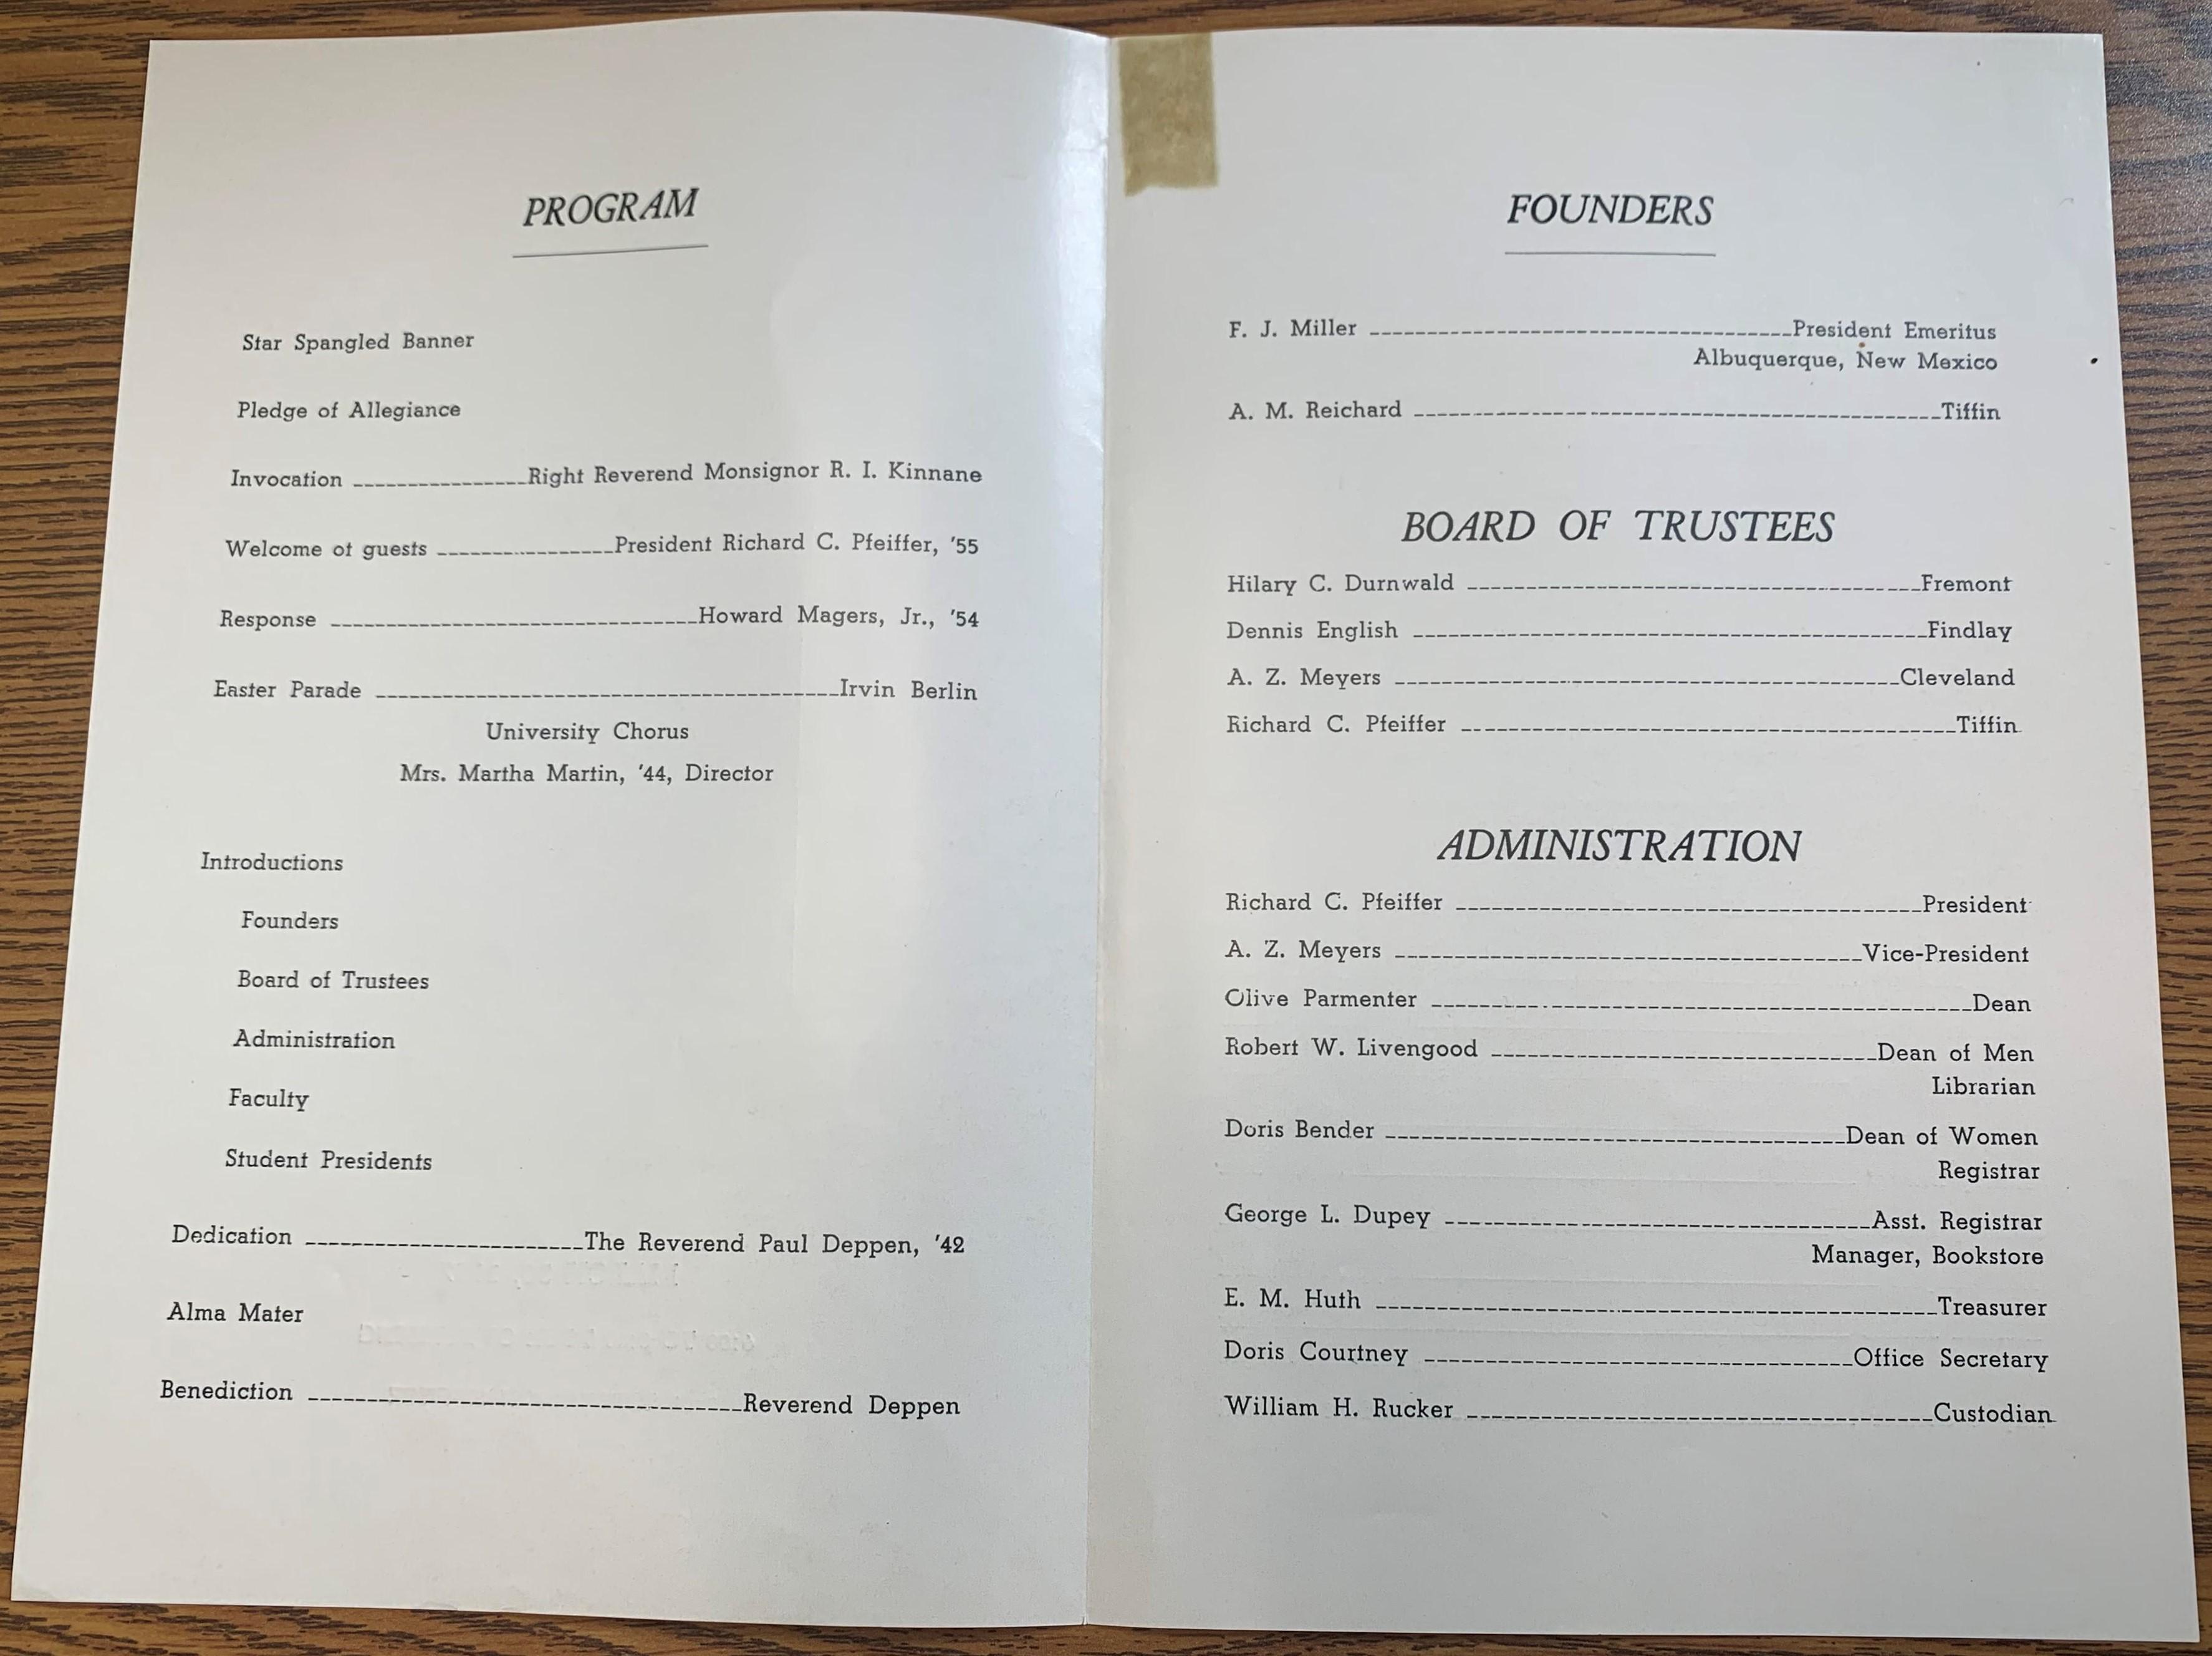 dedication program contents